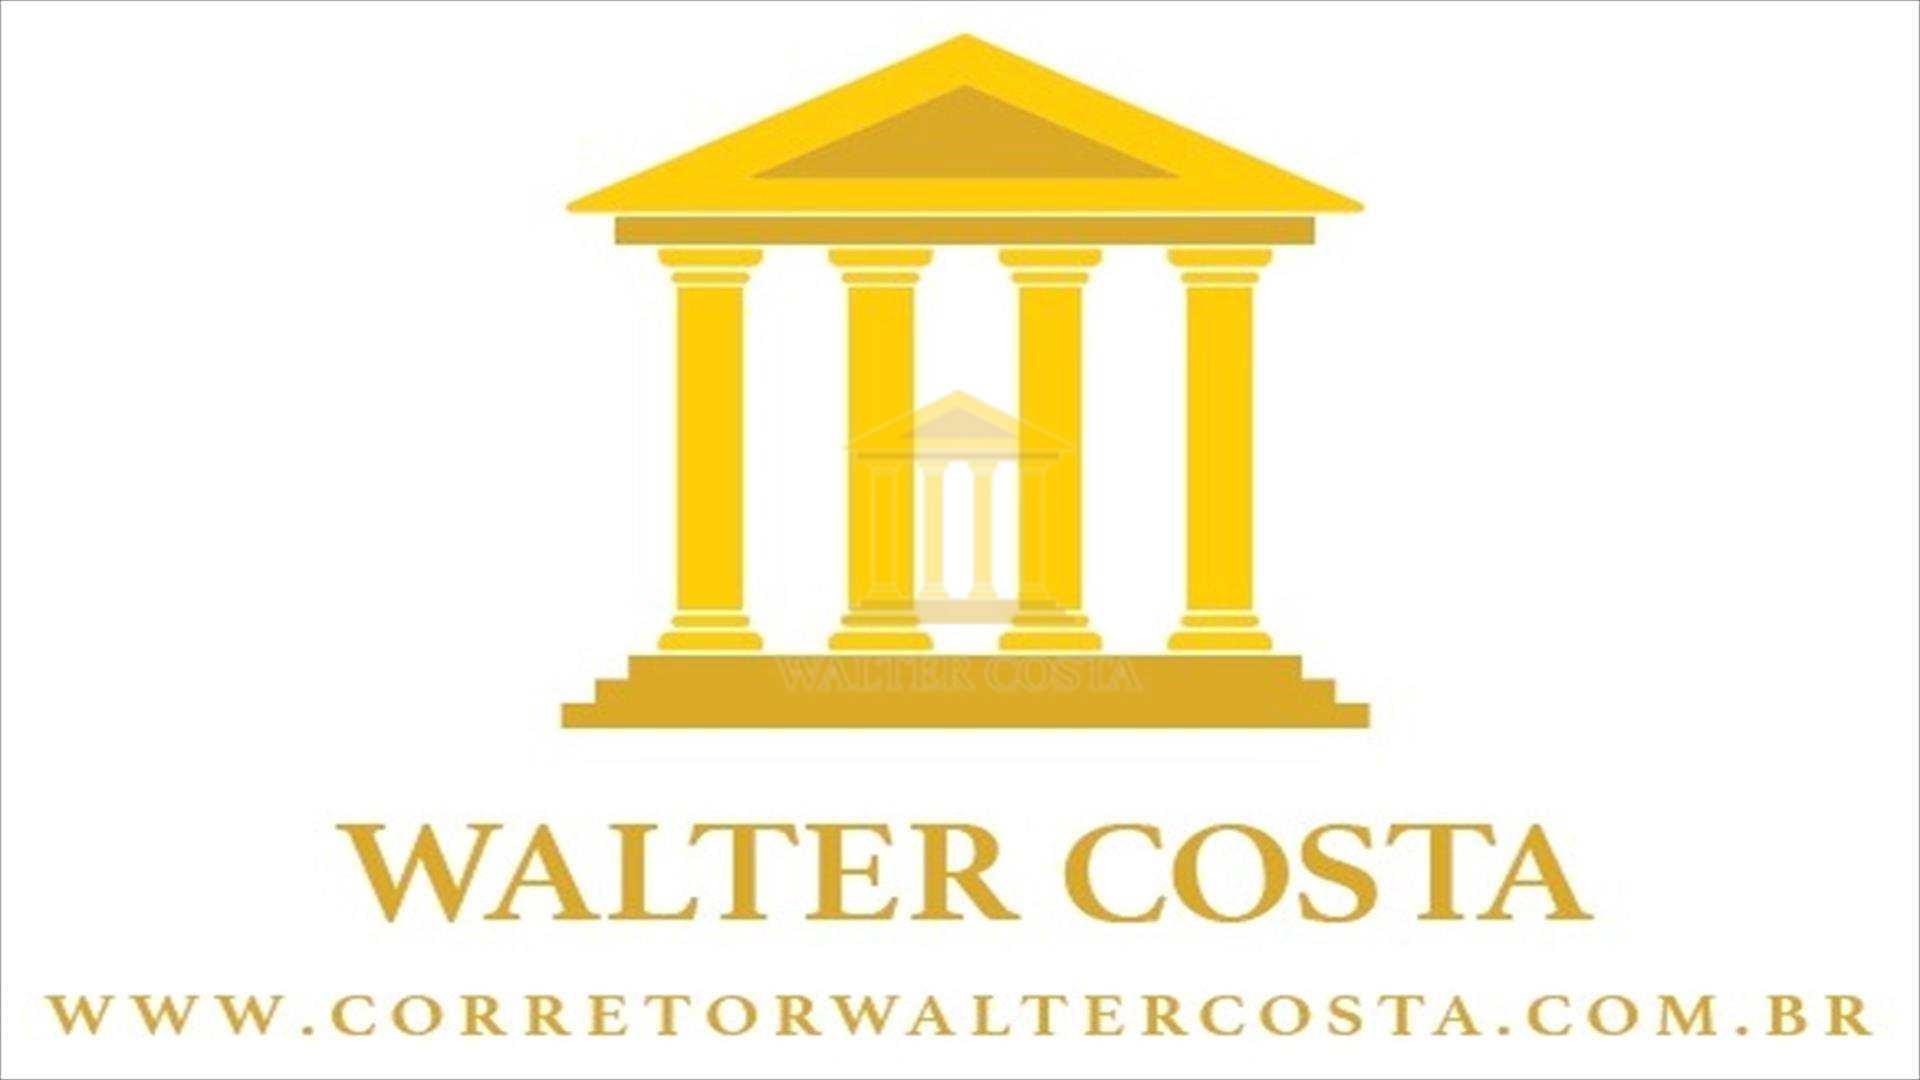 10400-LOGO_CORRETOR_WALTER_COSTA_NOVO.jpg